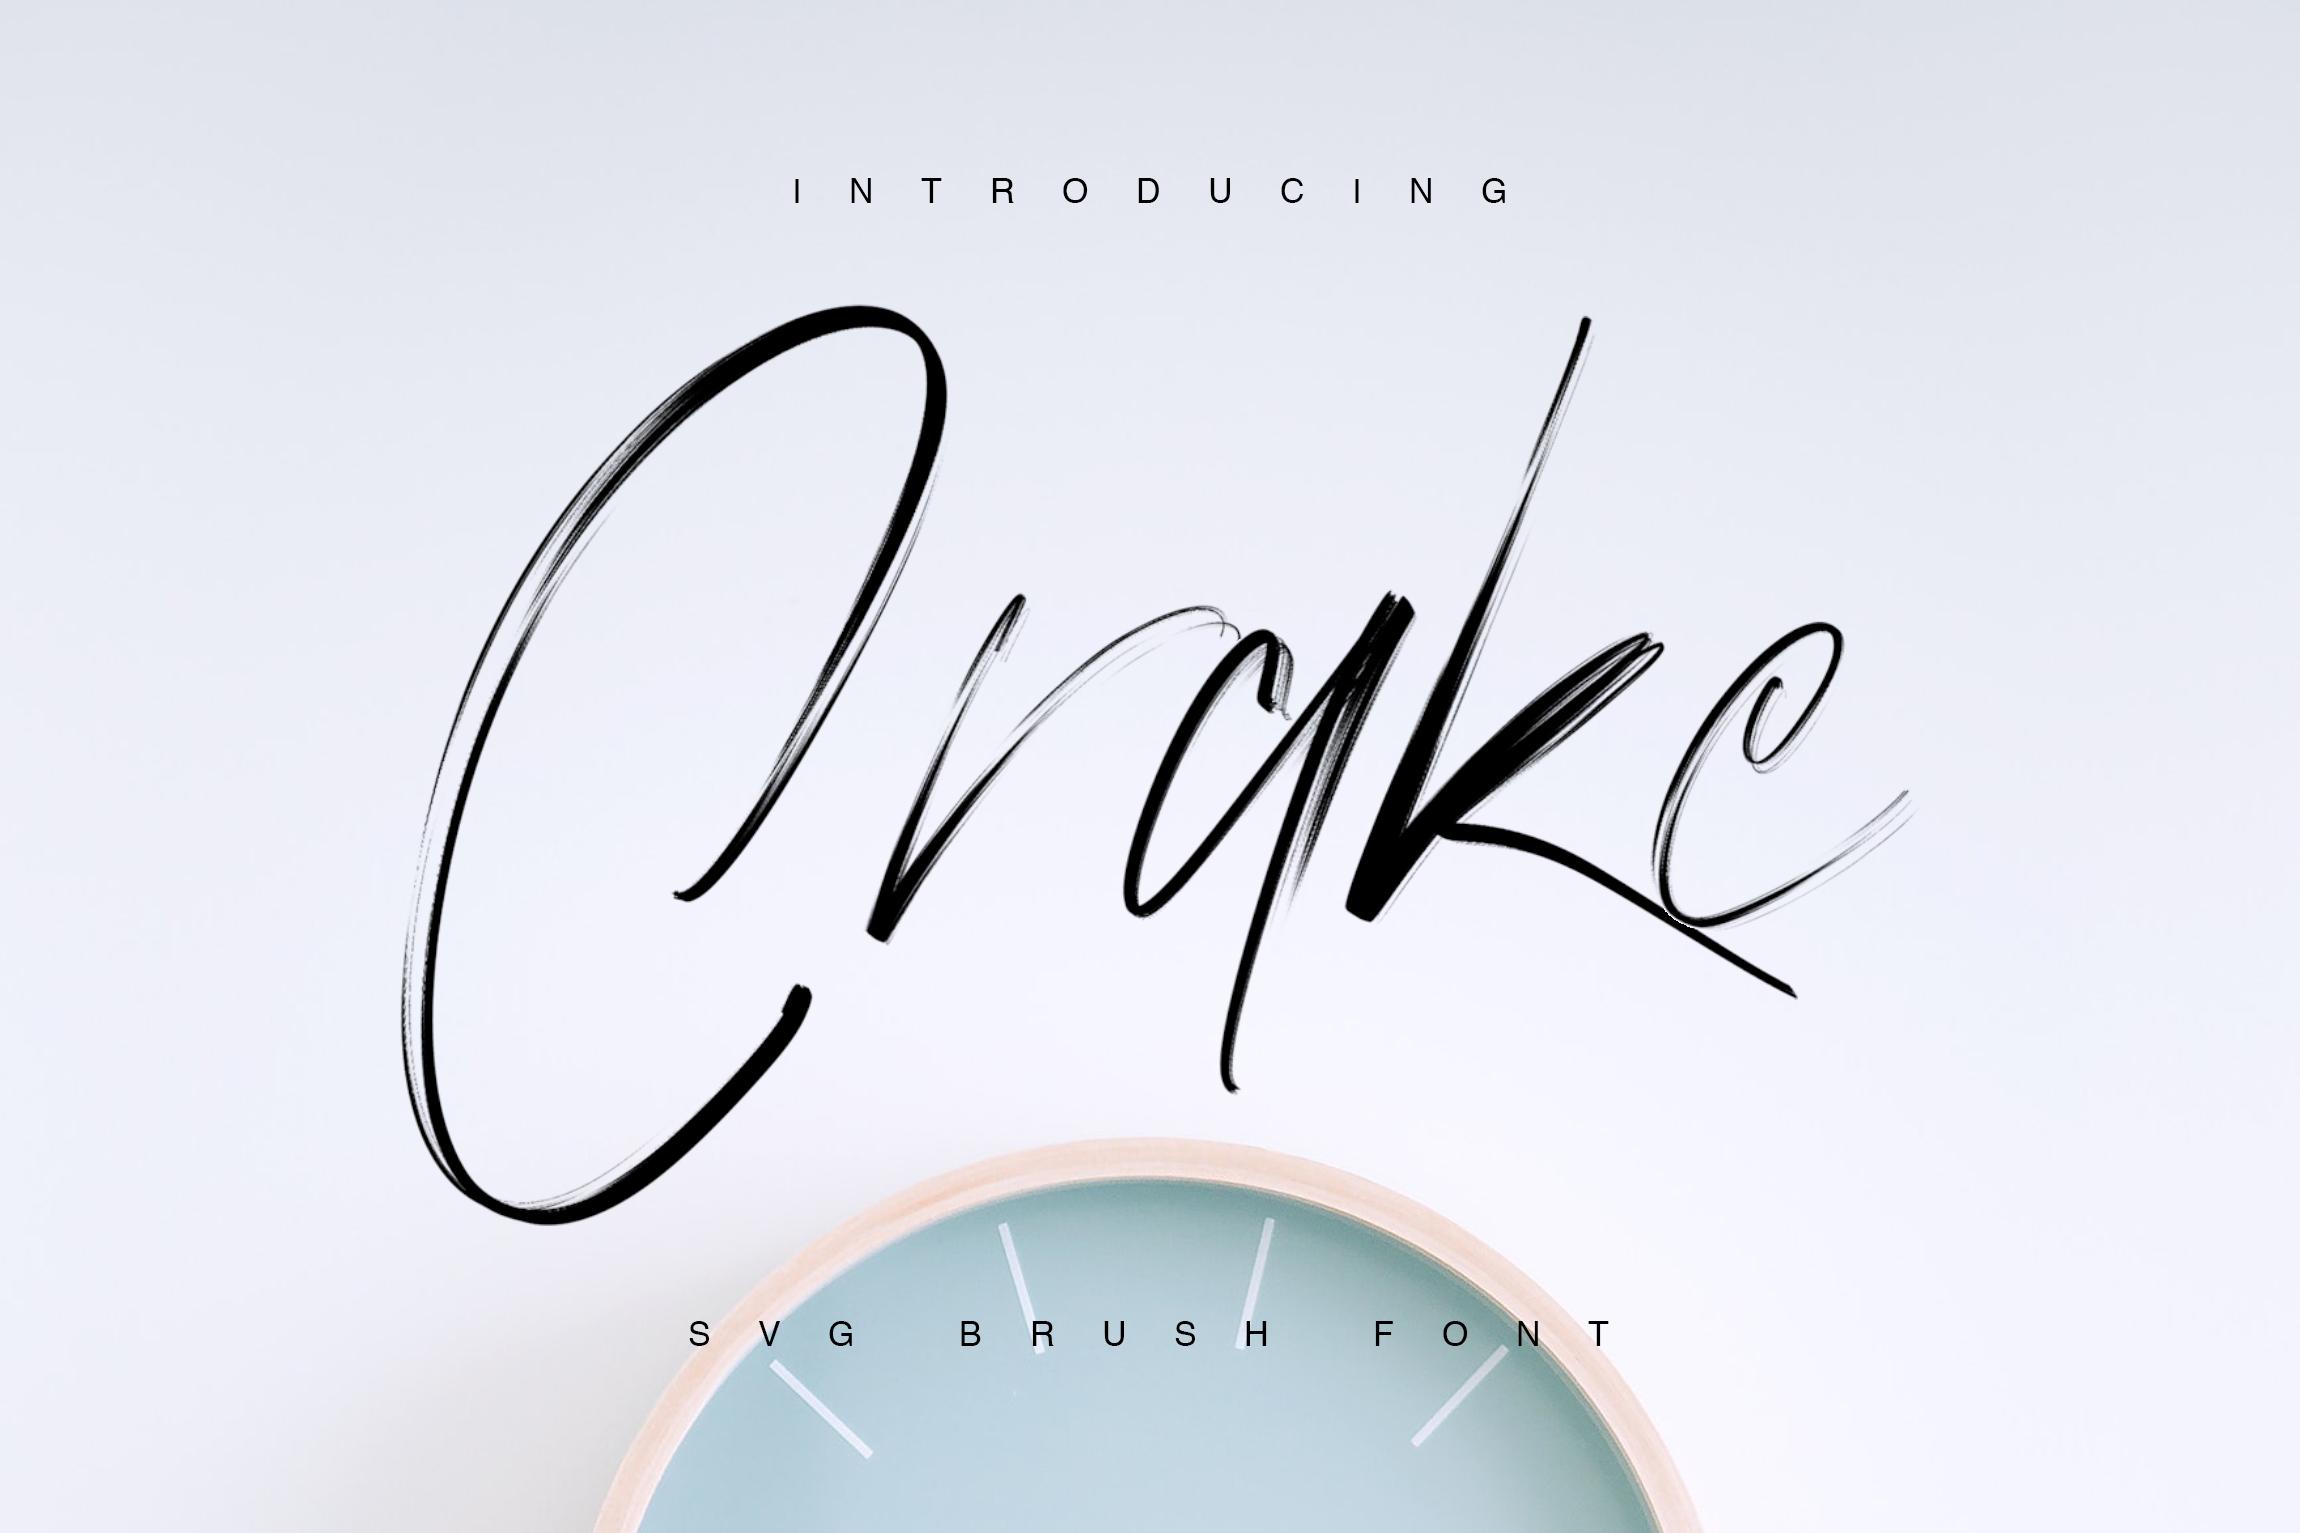 Crake - Brush SVG Font example image 1